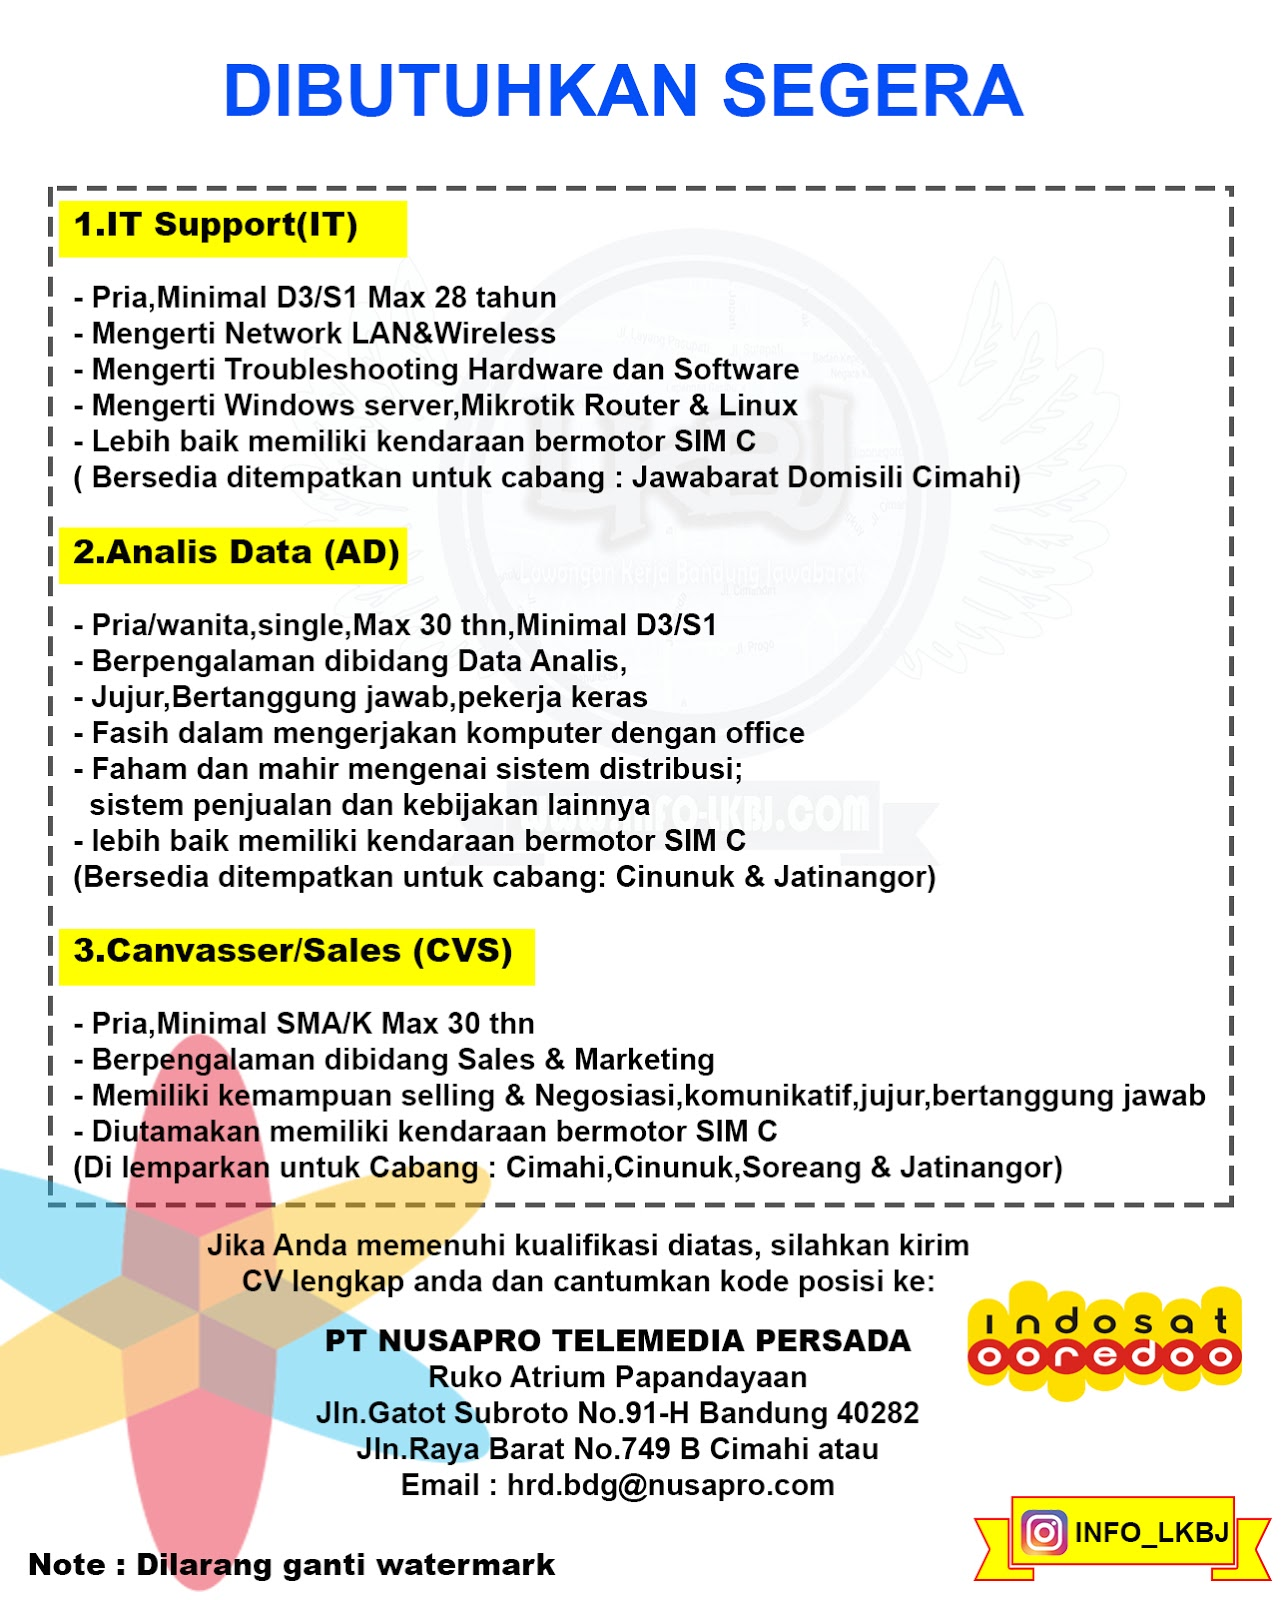 Pt Nusapro Telemedia Persada Lowongan Kerja Bandung Jawabarat